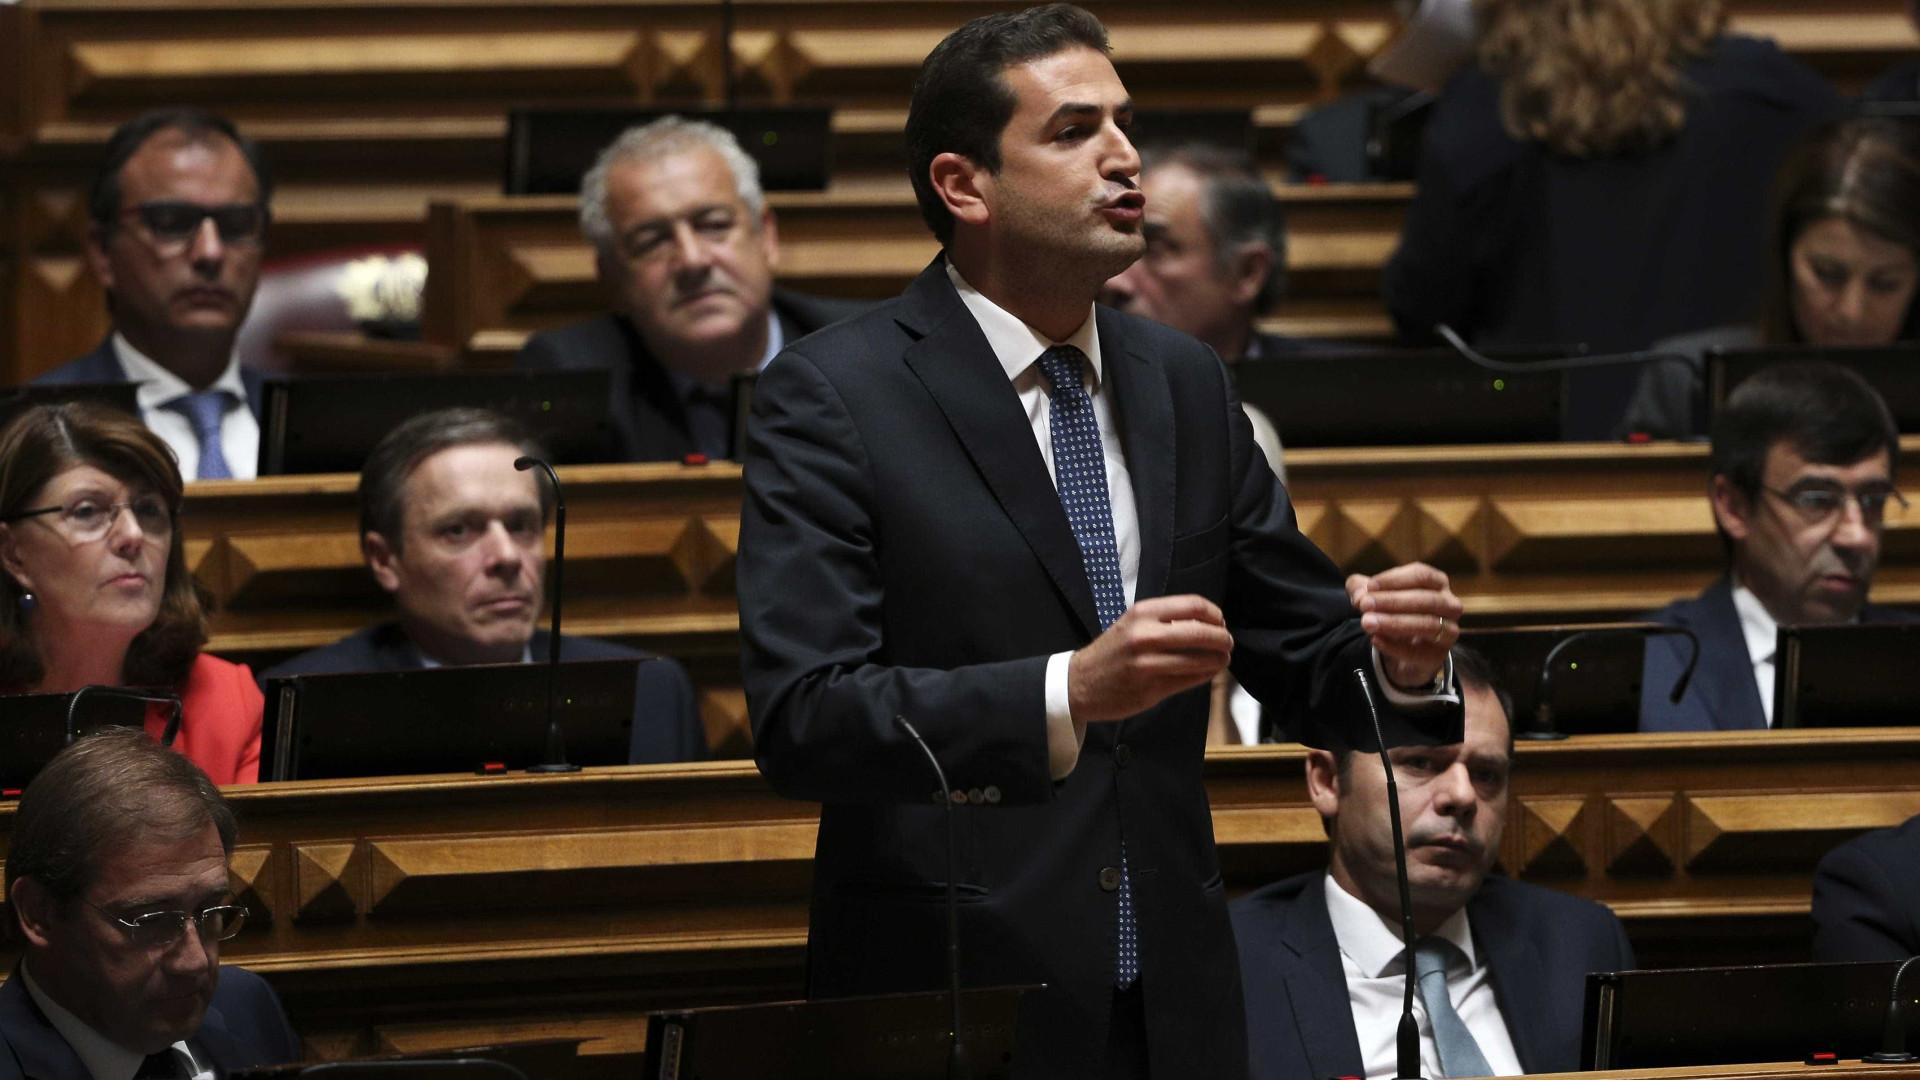 Hugo Soares acusa Carlos César de insultar bancada do PSD